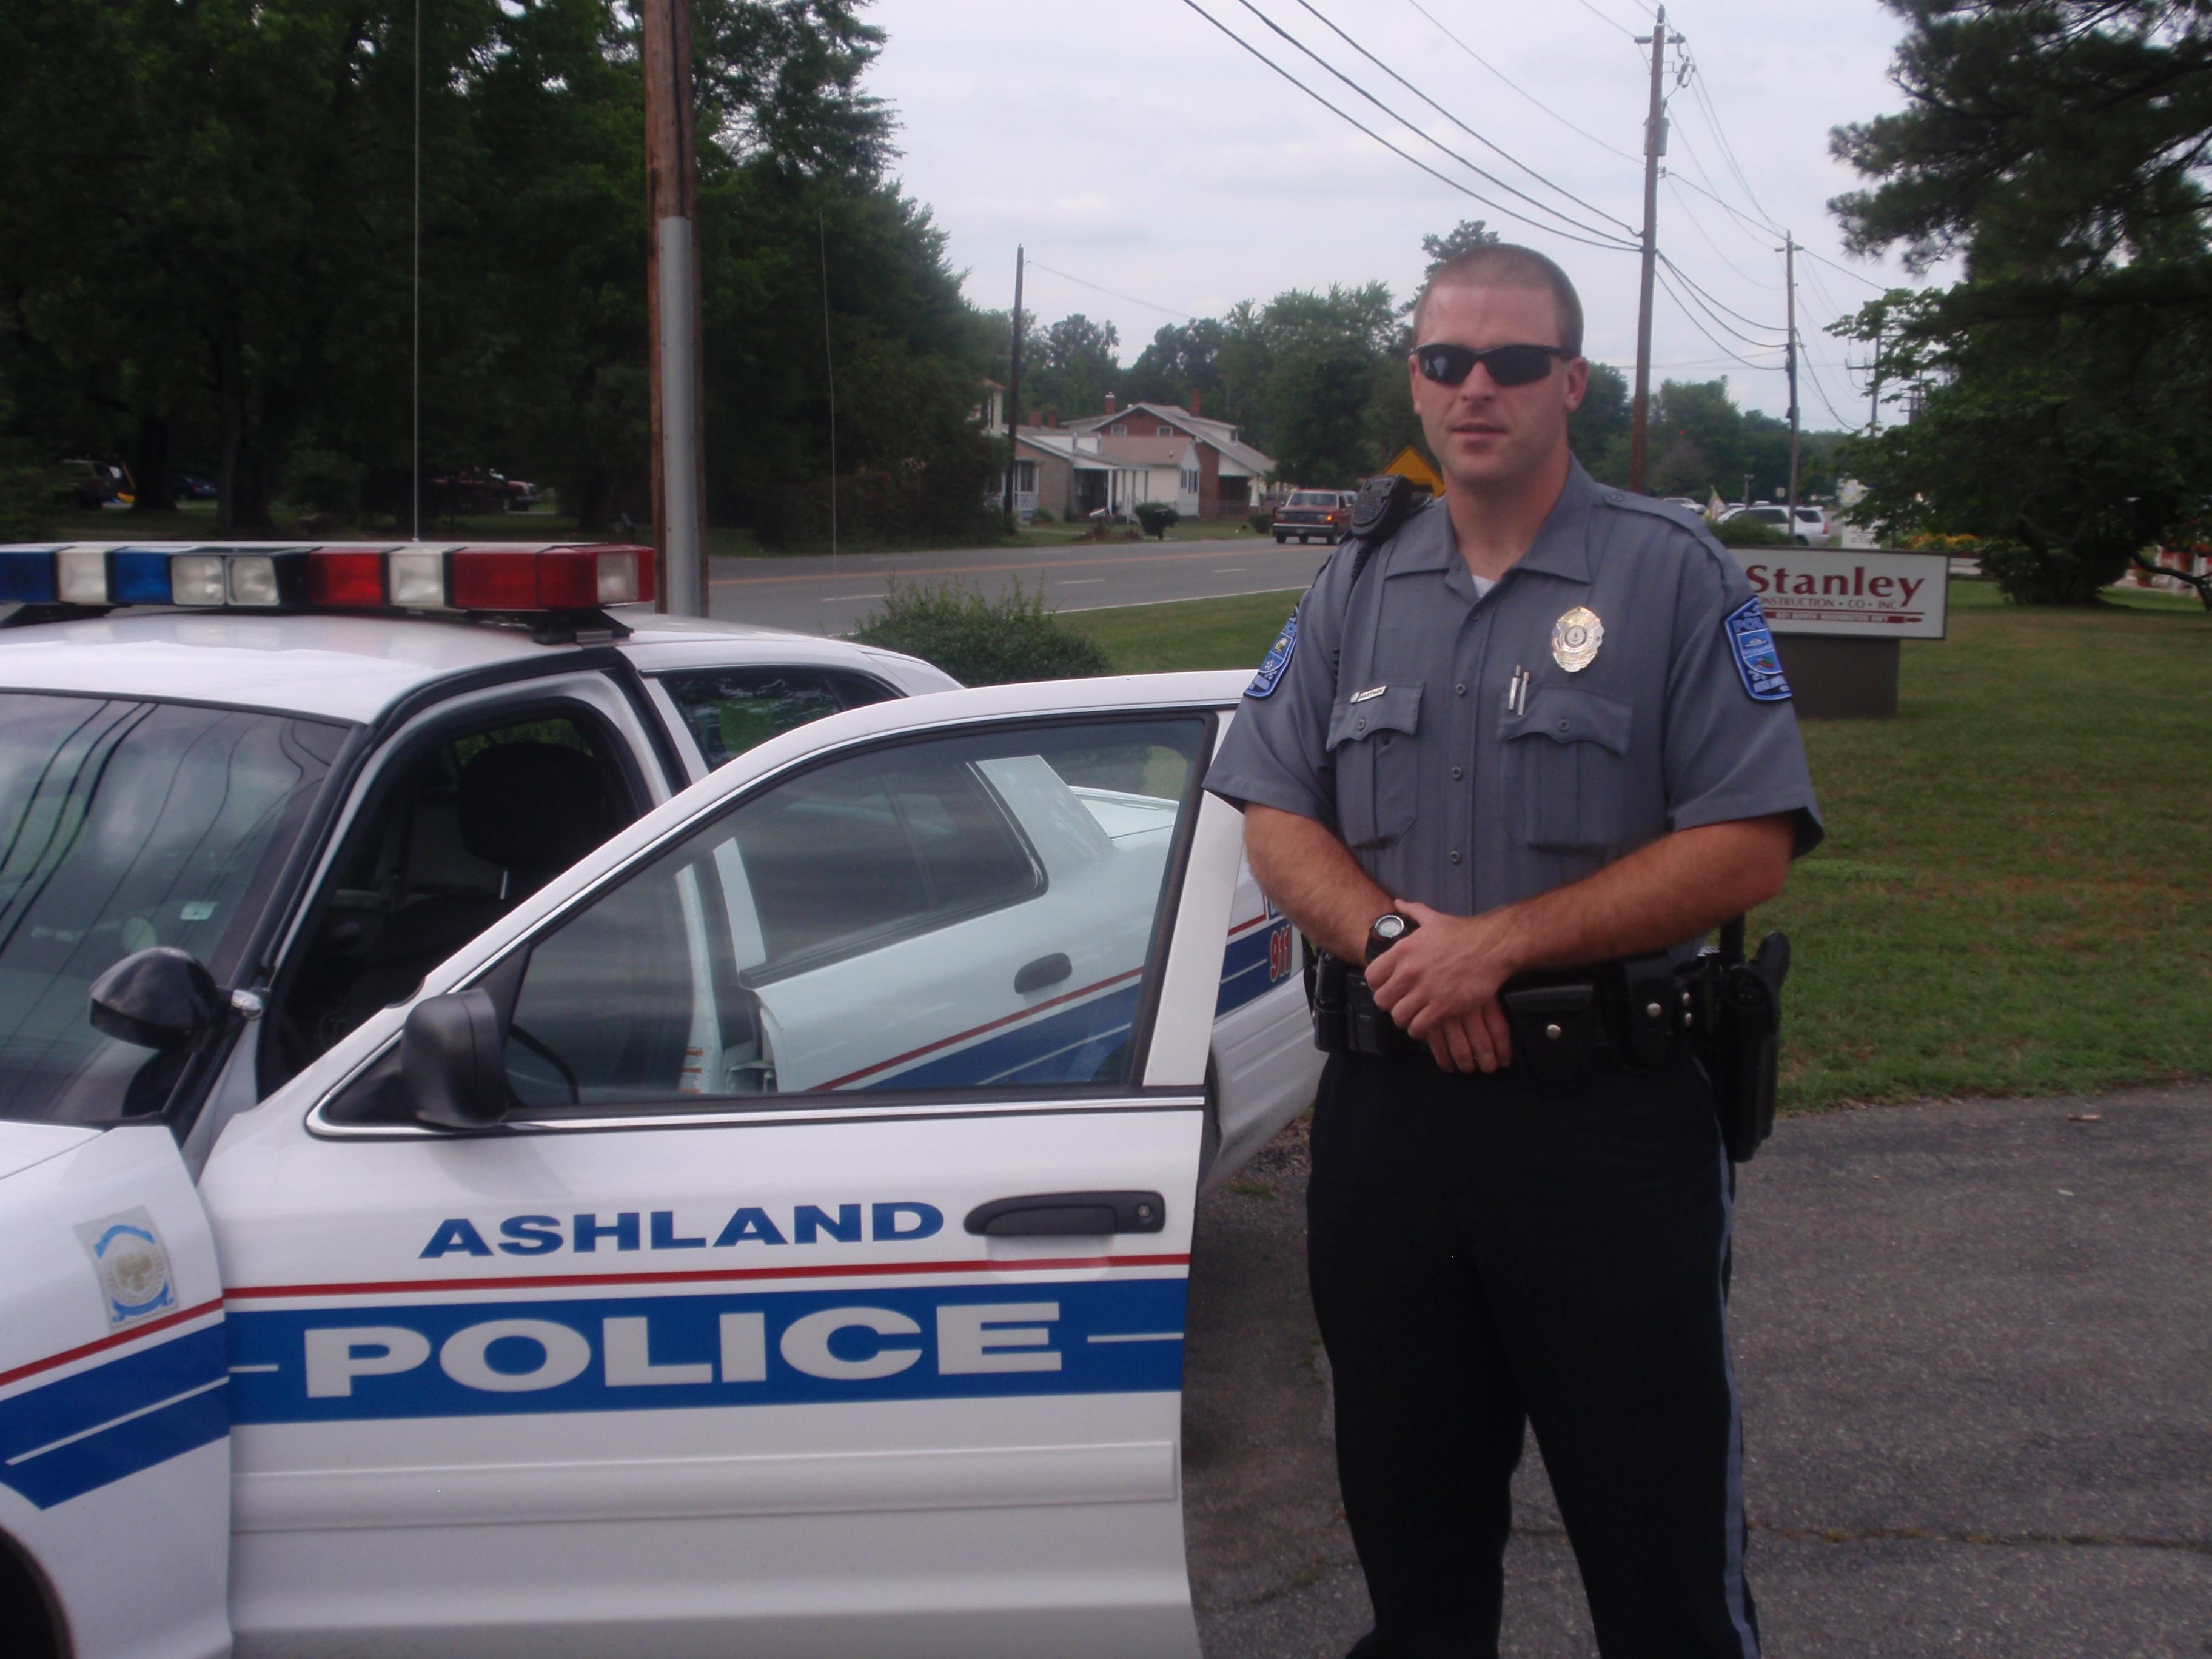 ashland Police Officer